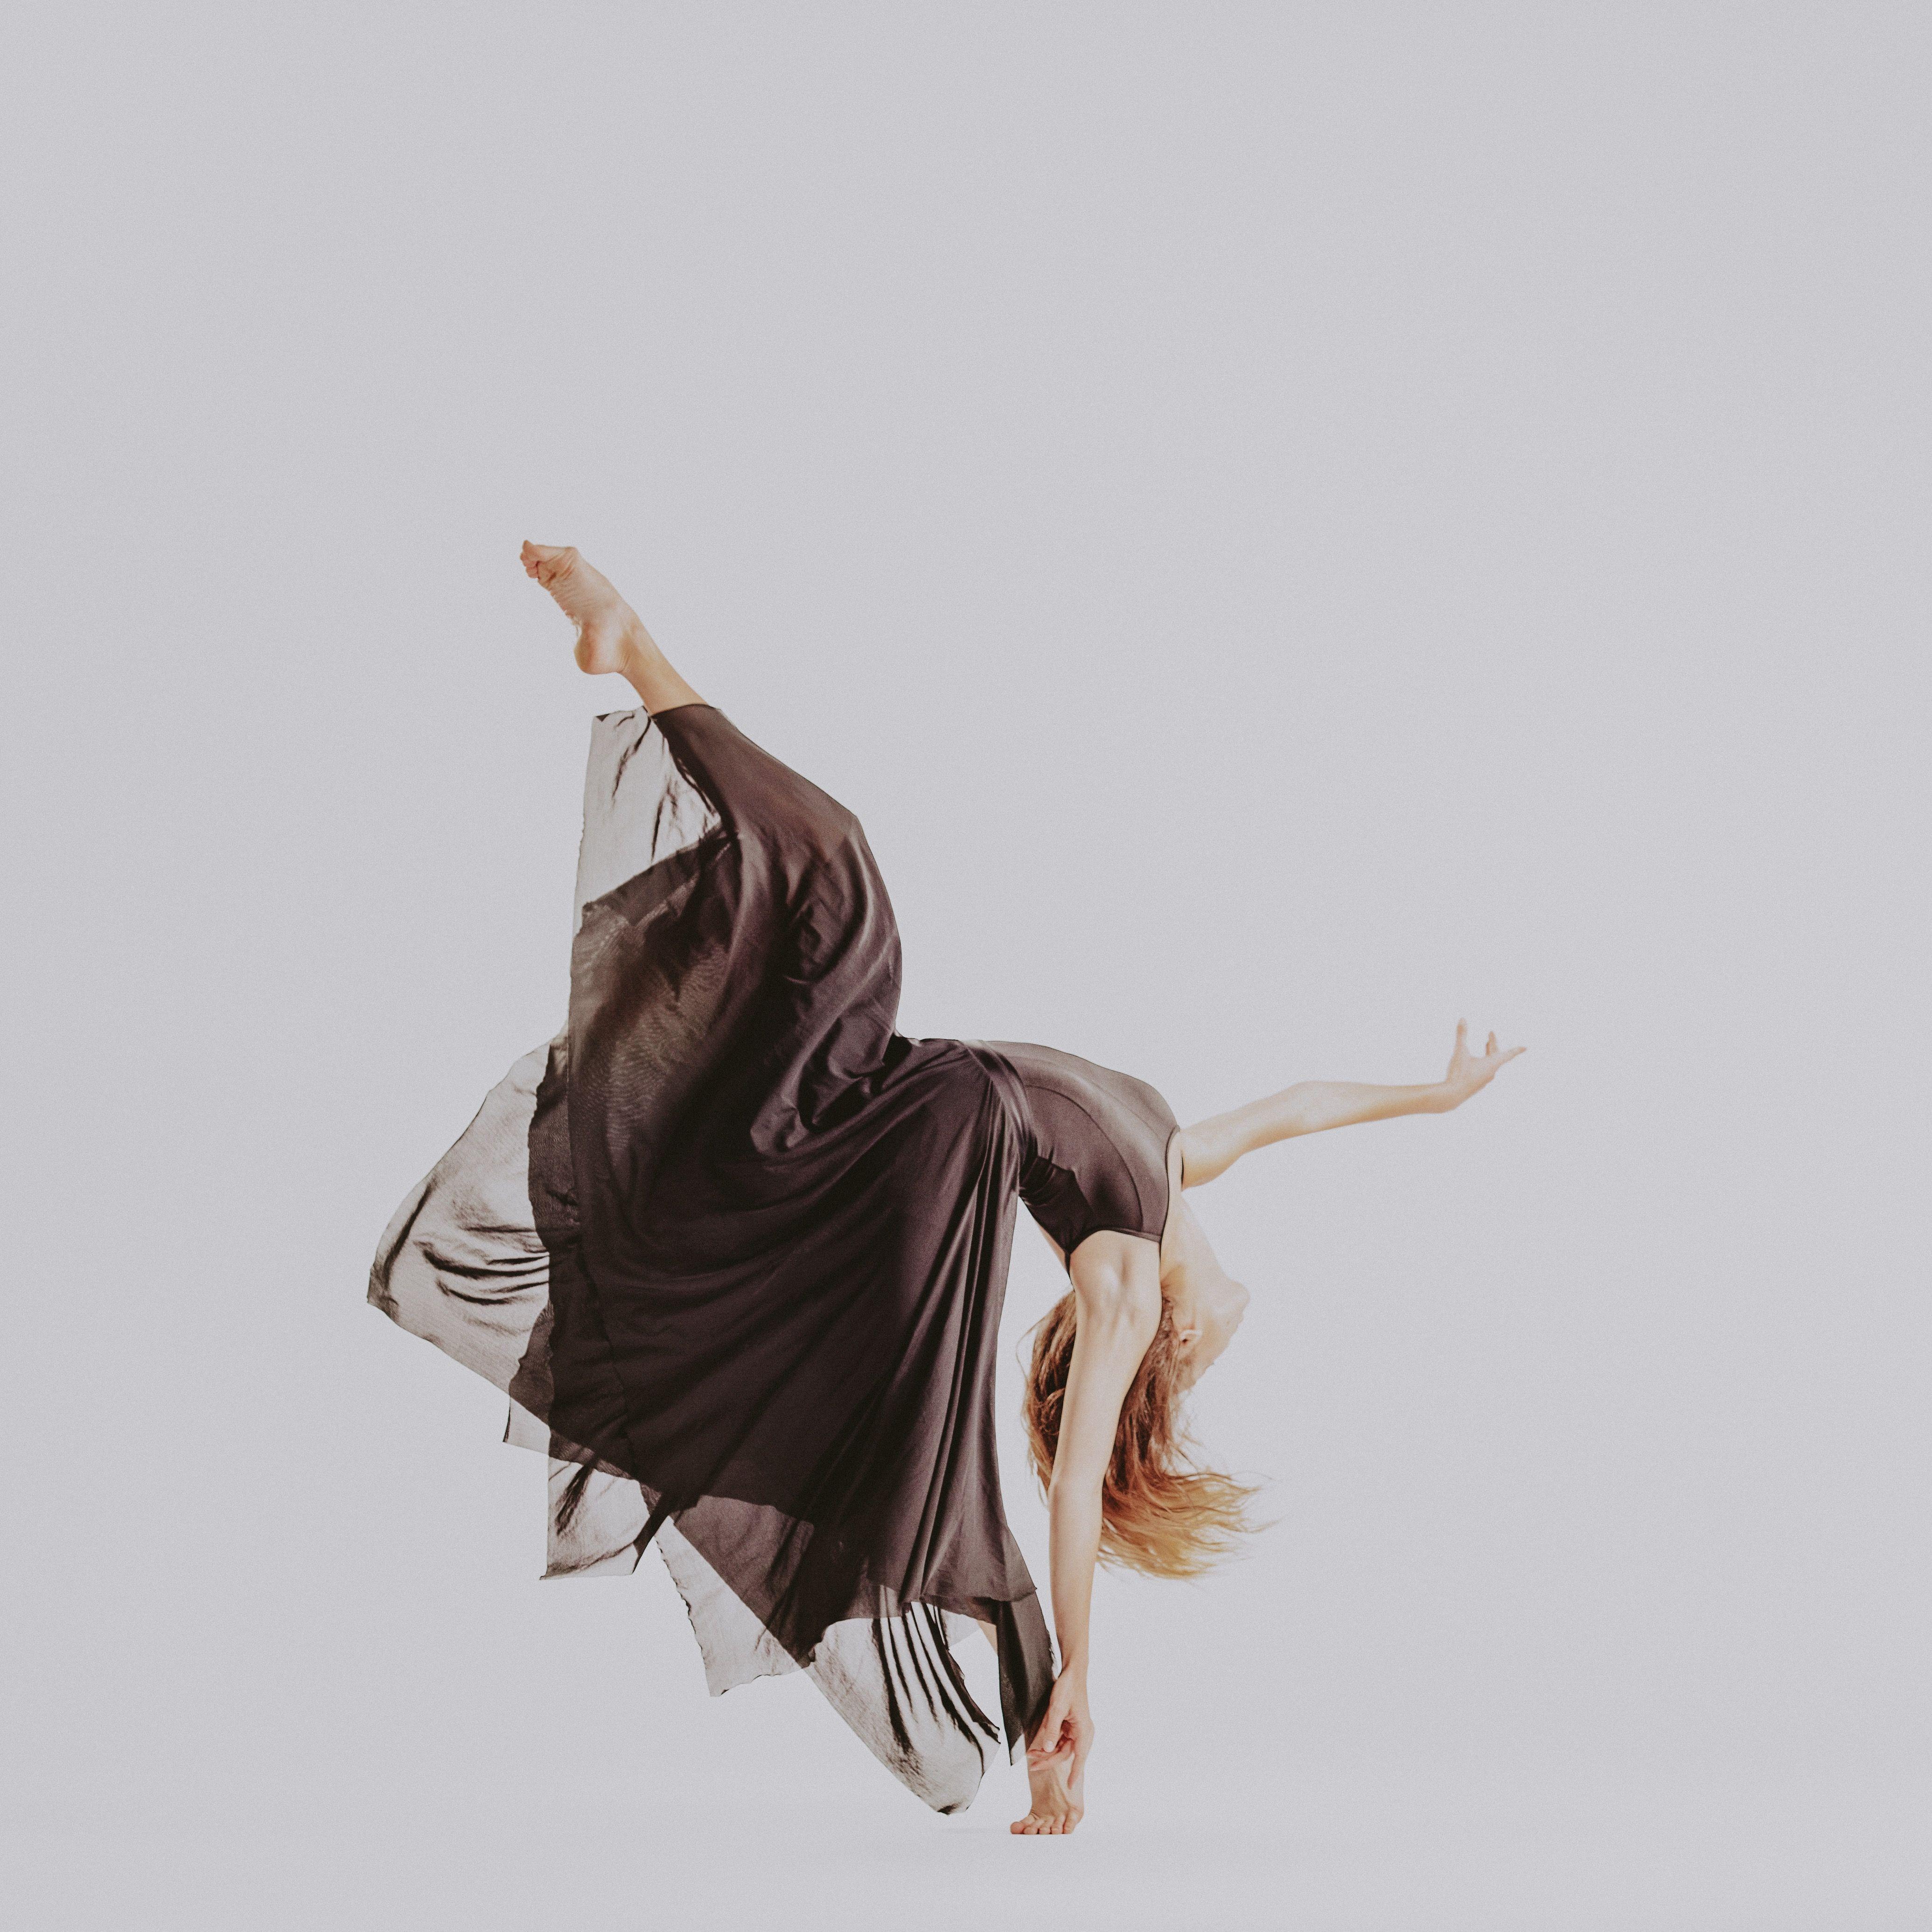 Pin by Blu on Just Dance!! Just dance, Dance, Dance studio